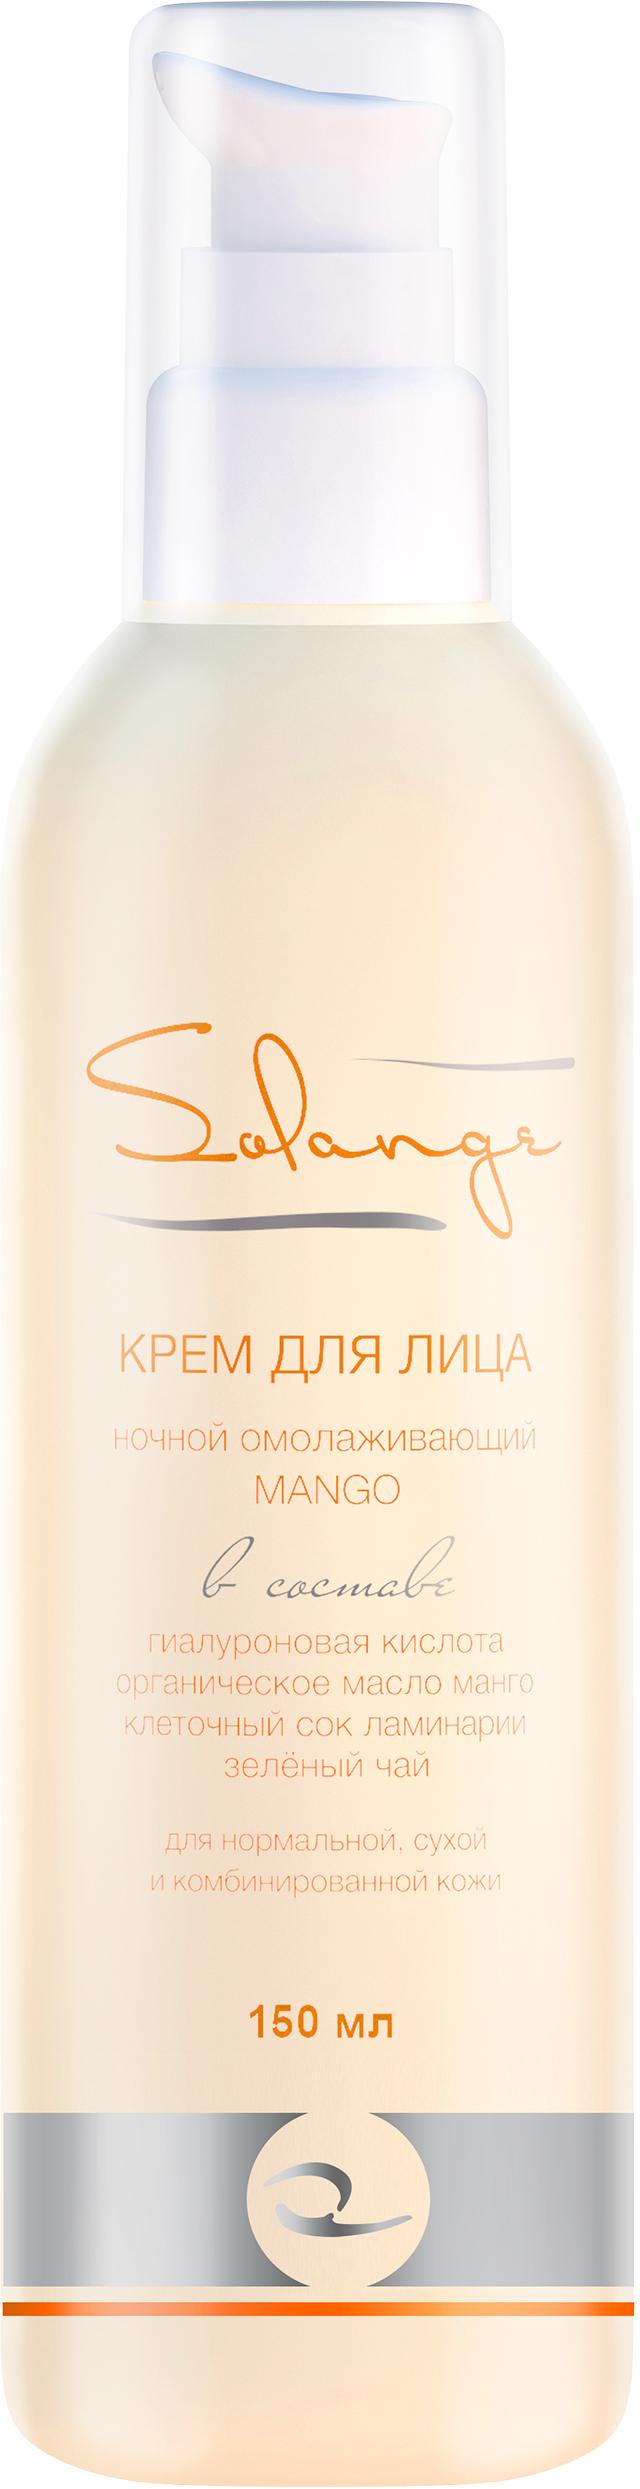 SolangeНочной омолаживающий крем, 150 мл Solange